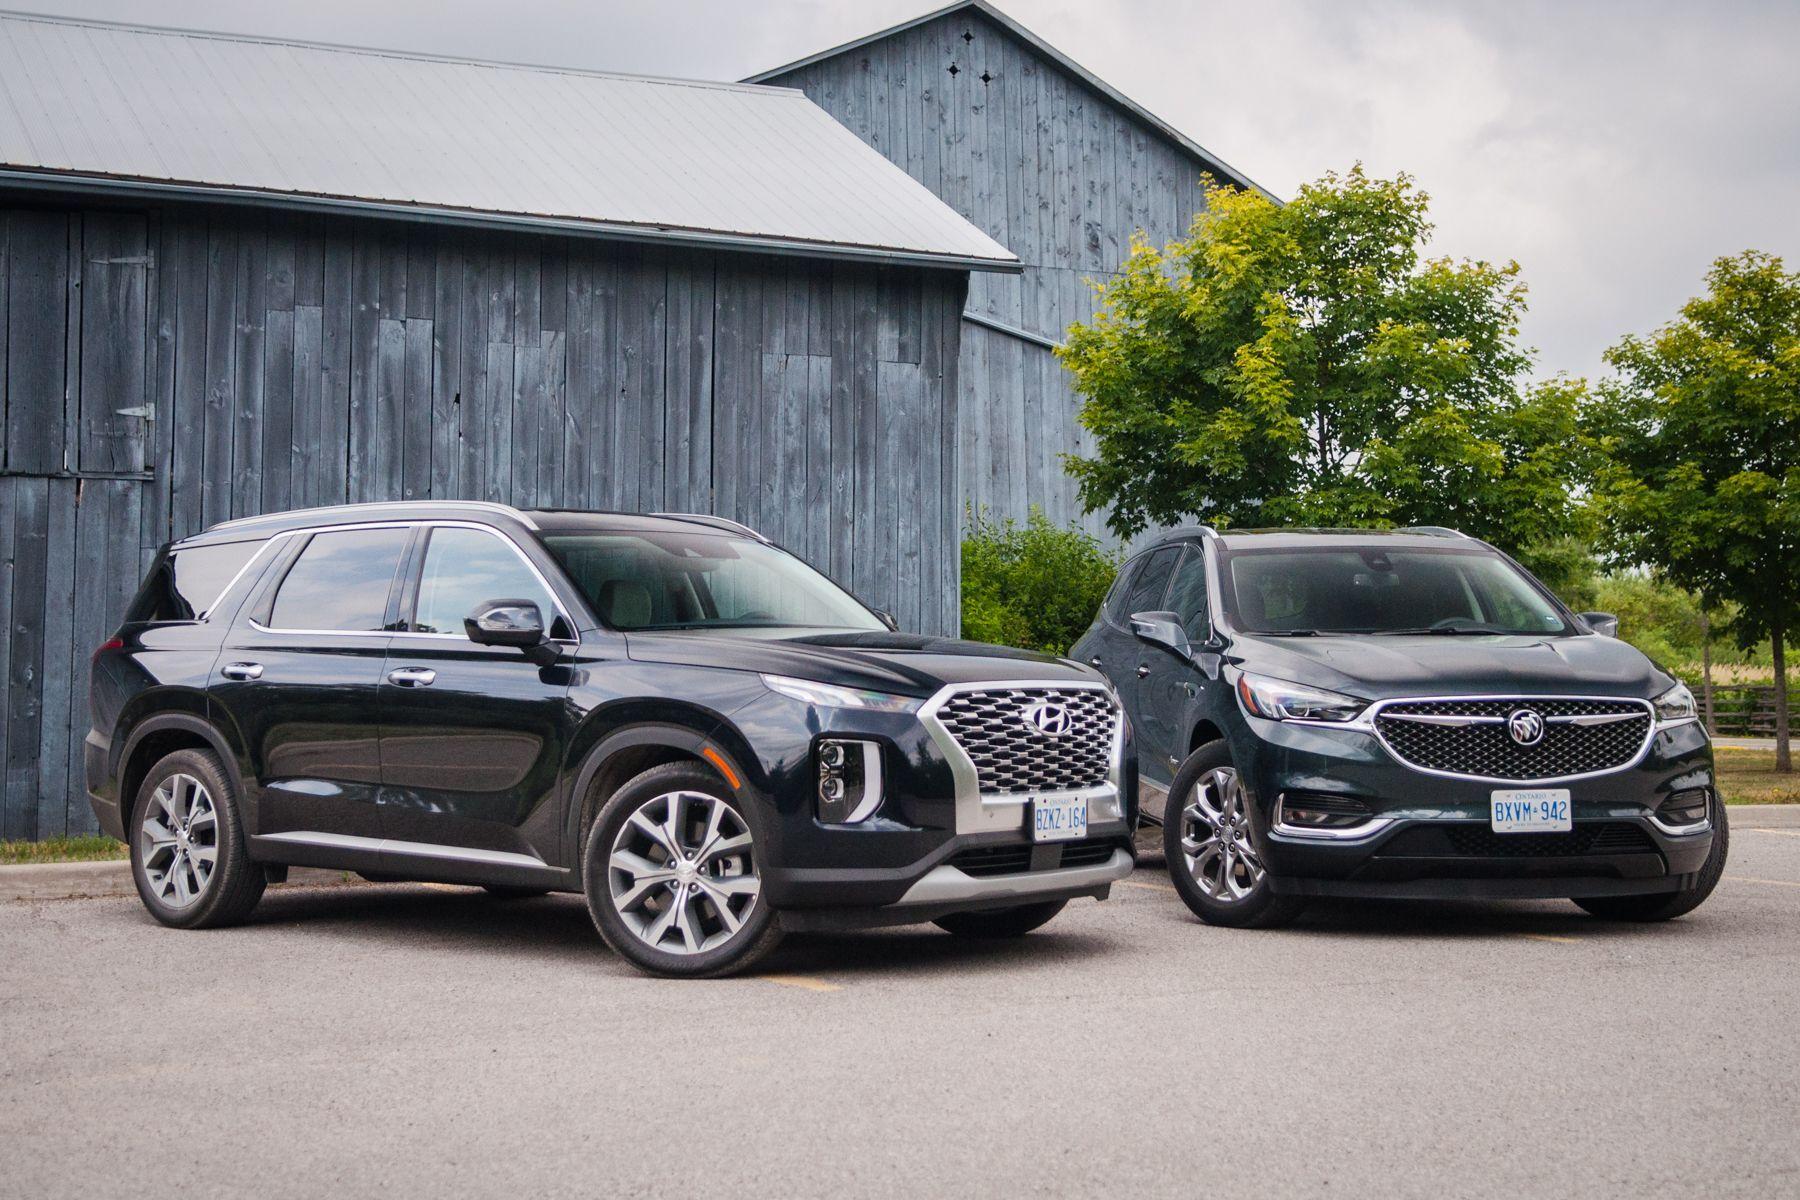 Suv Comparison 2020 Hyundai Palisade Vs 2019 Buick Enclave Buick Suv